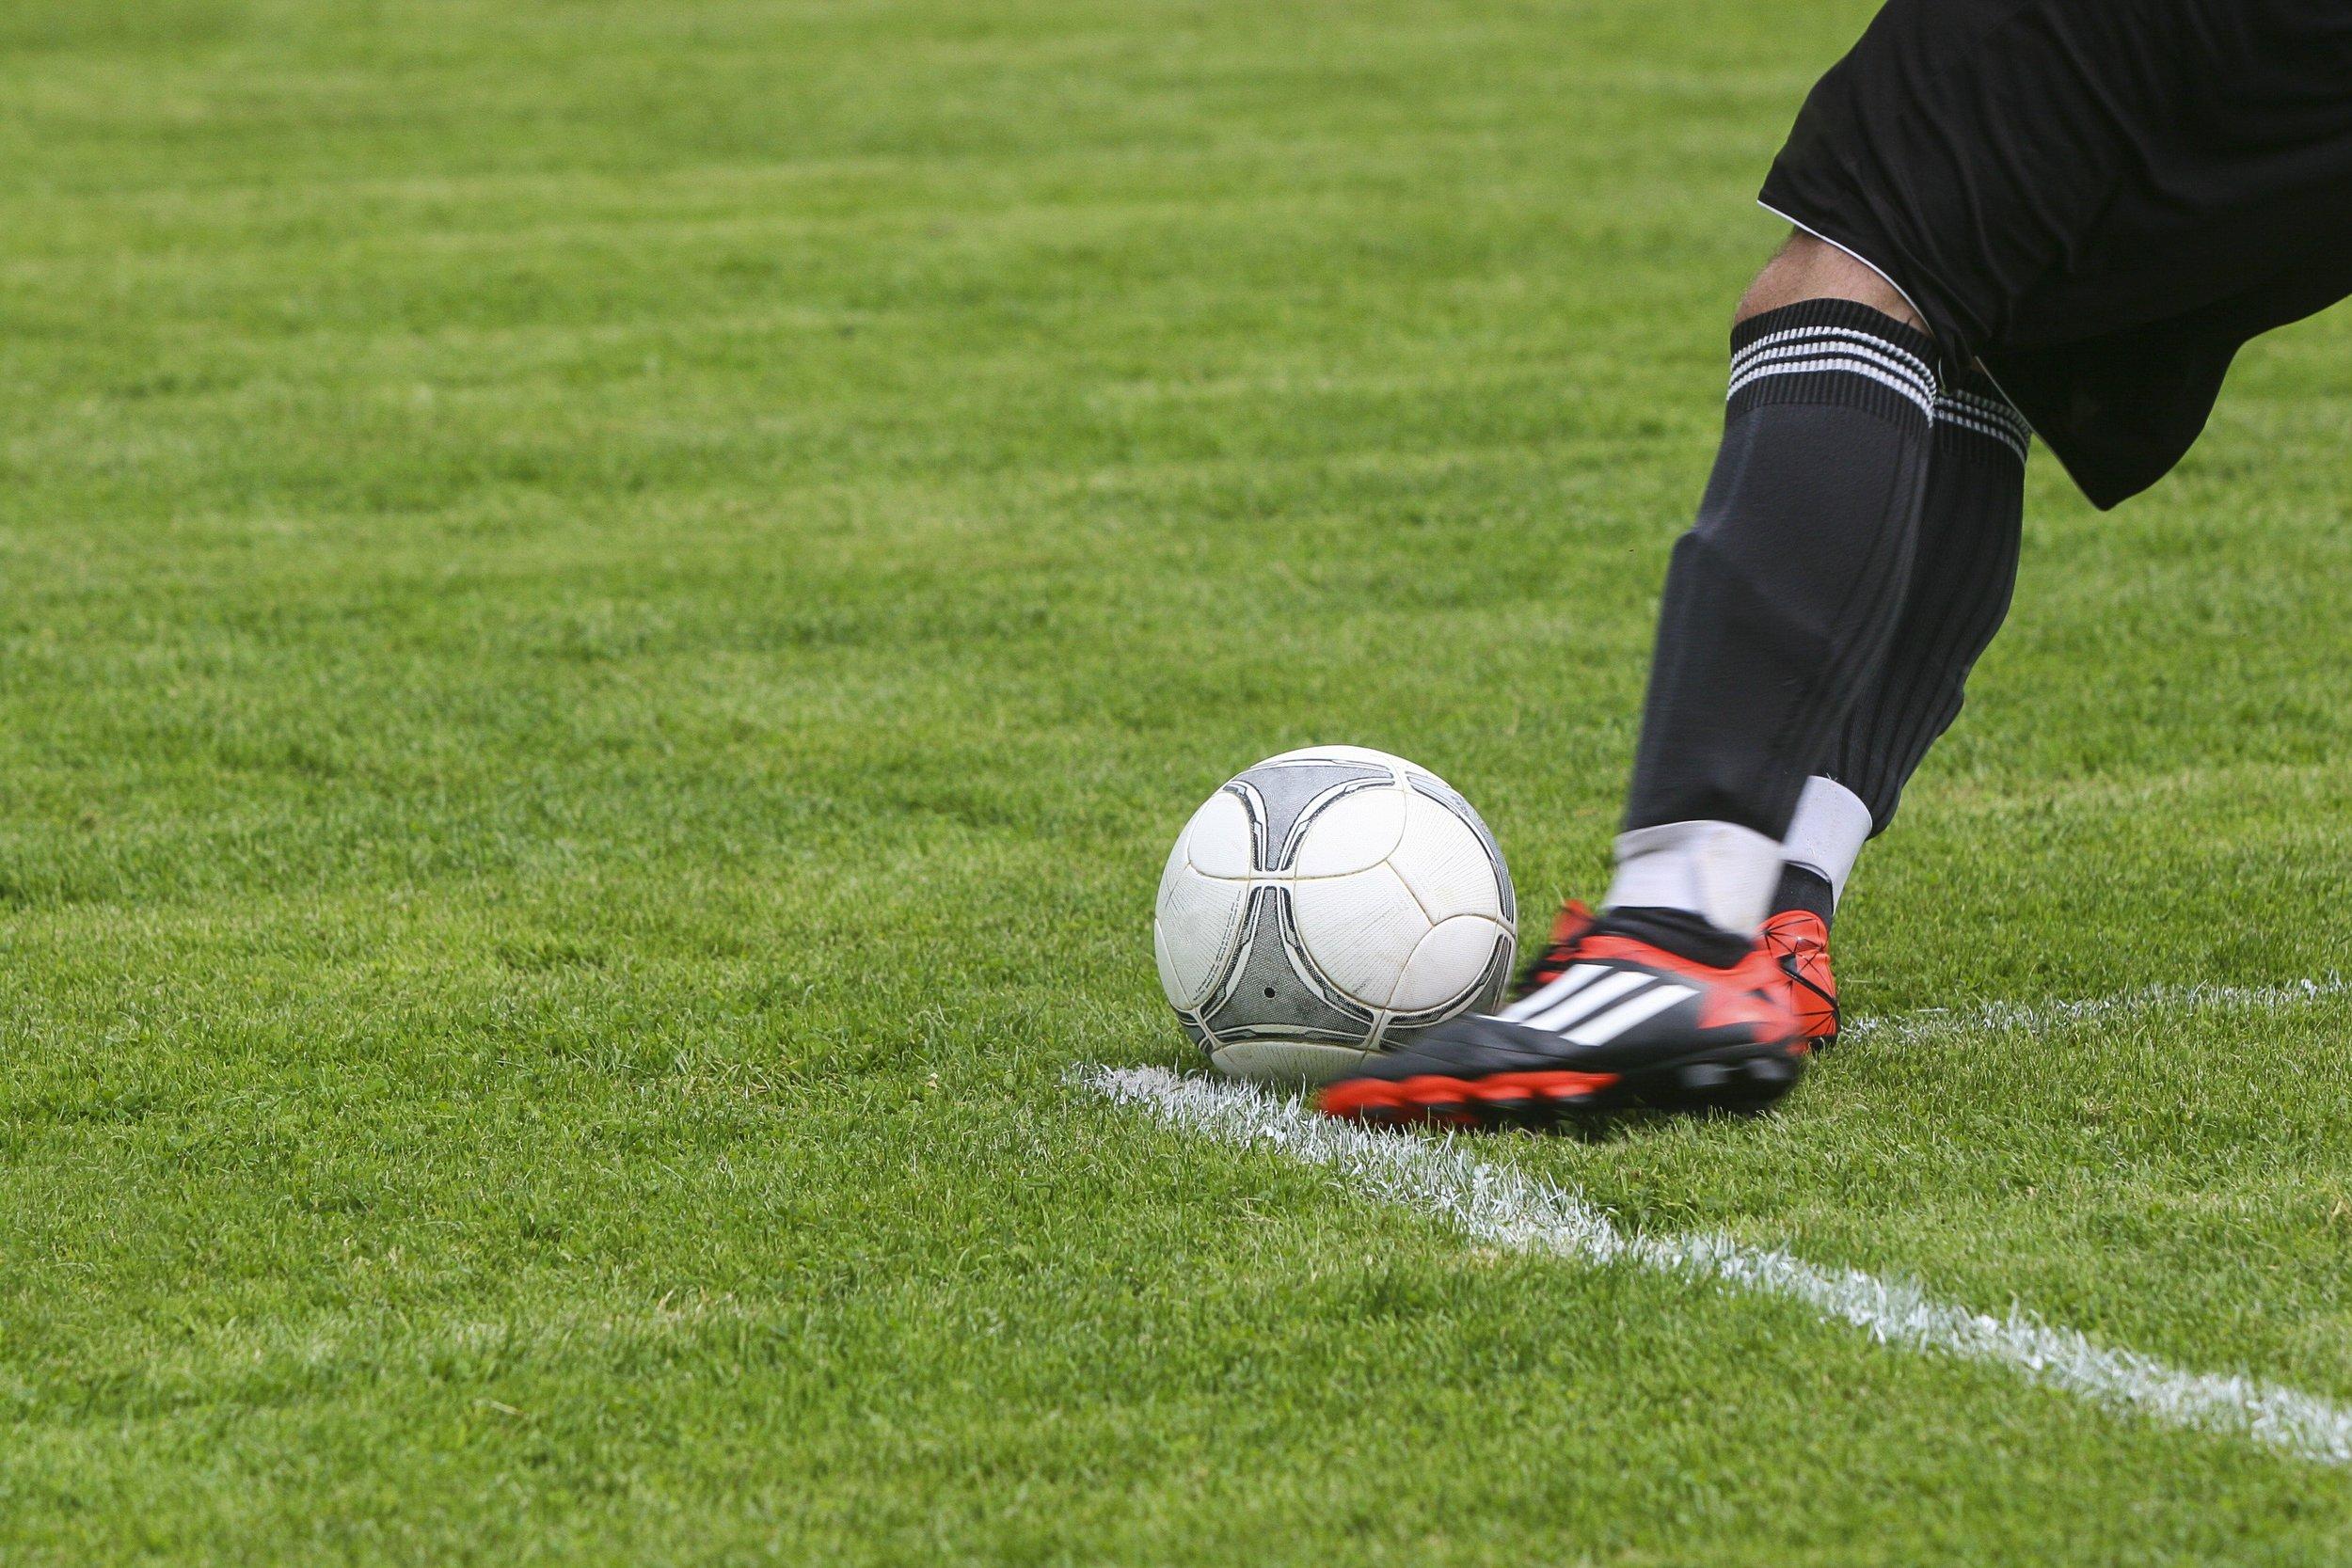 activity-ball-equipment-50713.jpg